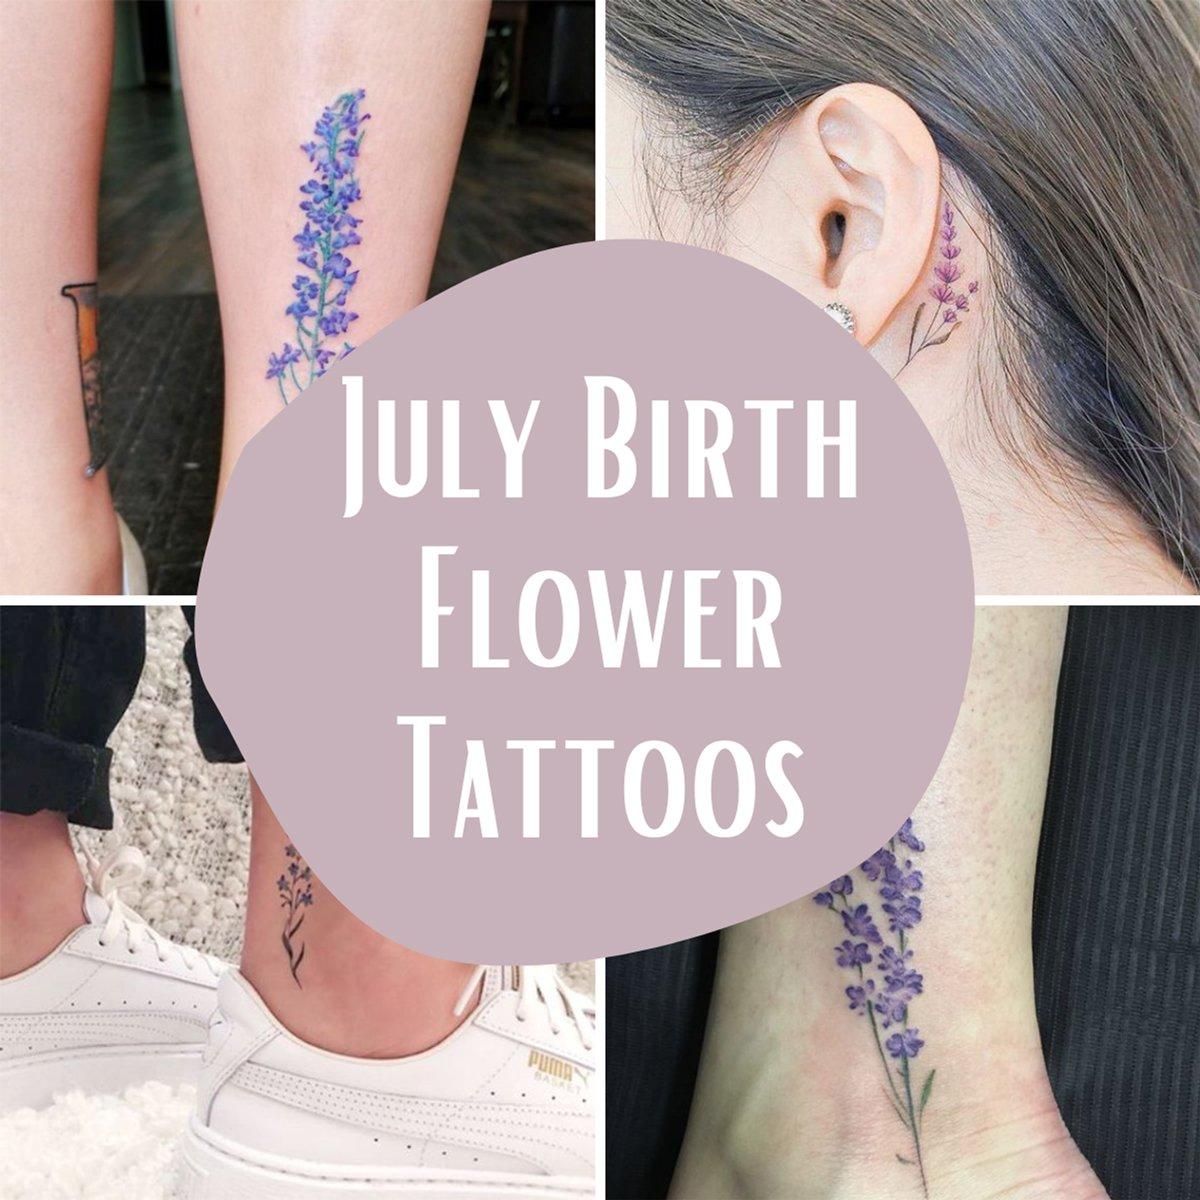 July Birth Flower Tattoos